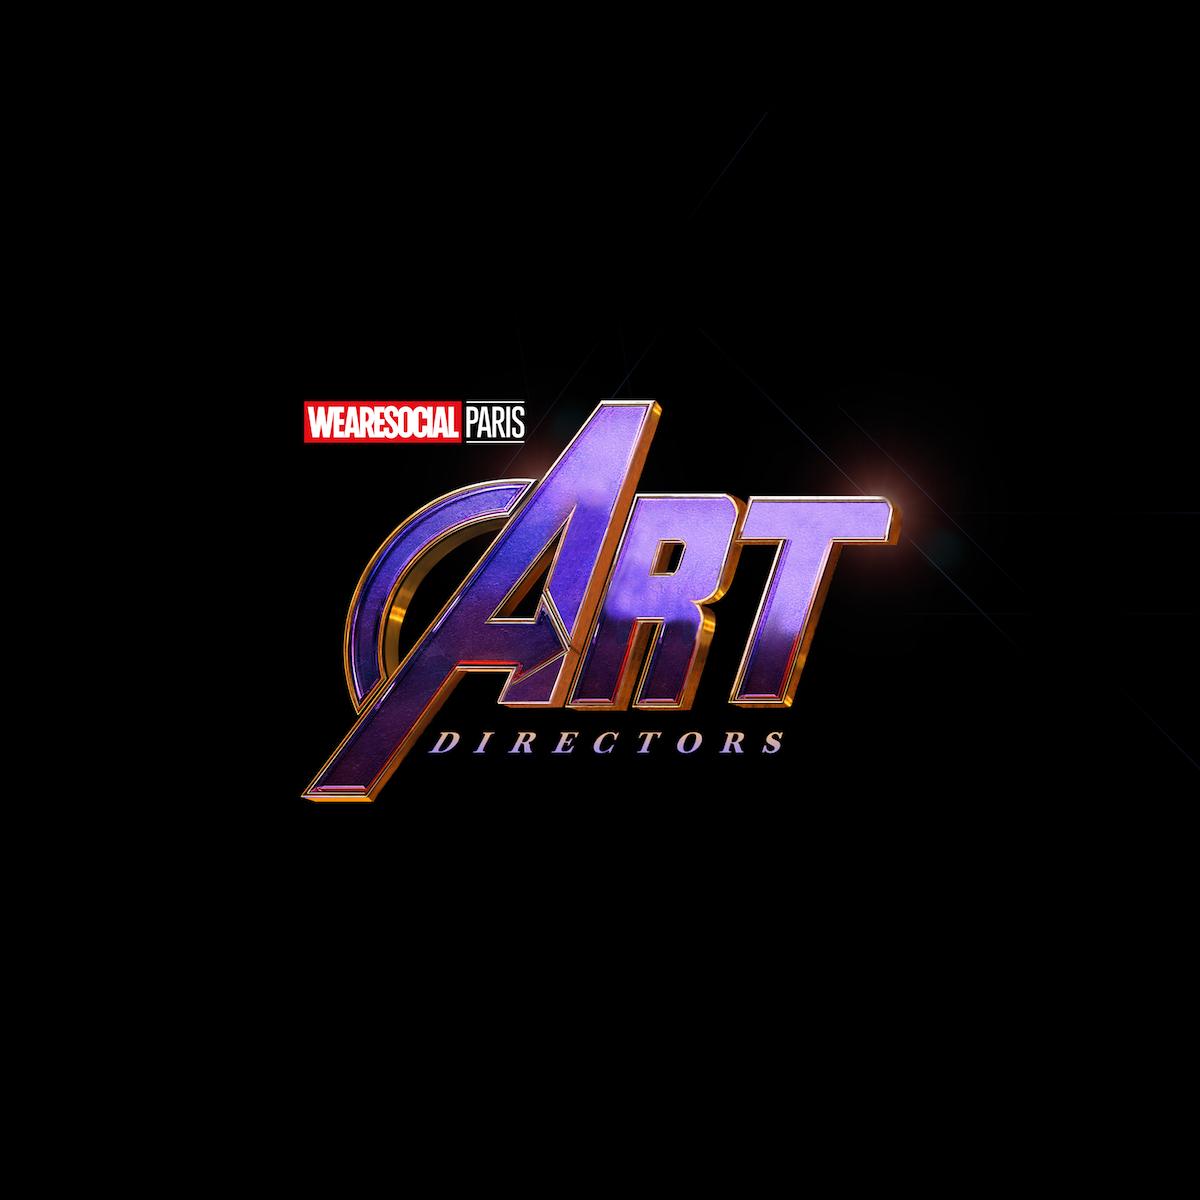 Superhero Logos for creative agency job titles - Art Directors / The Avengers